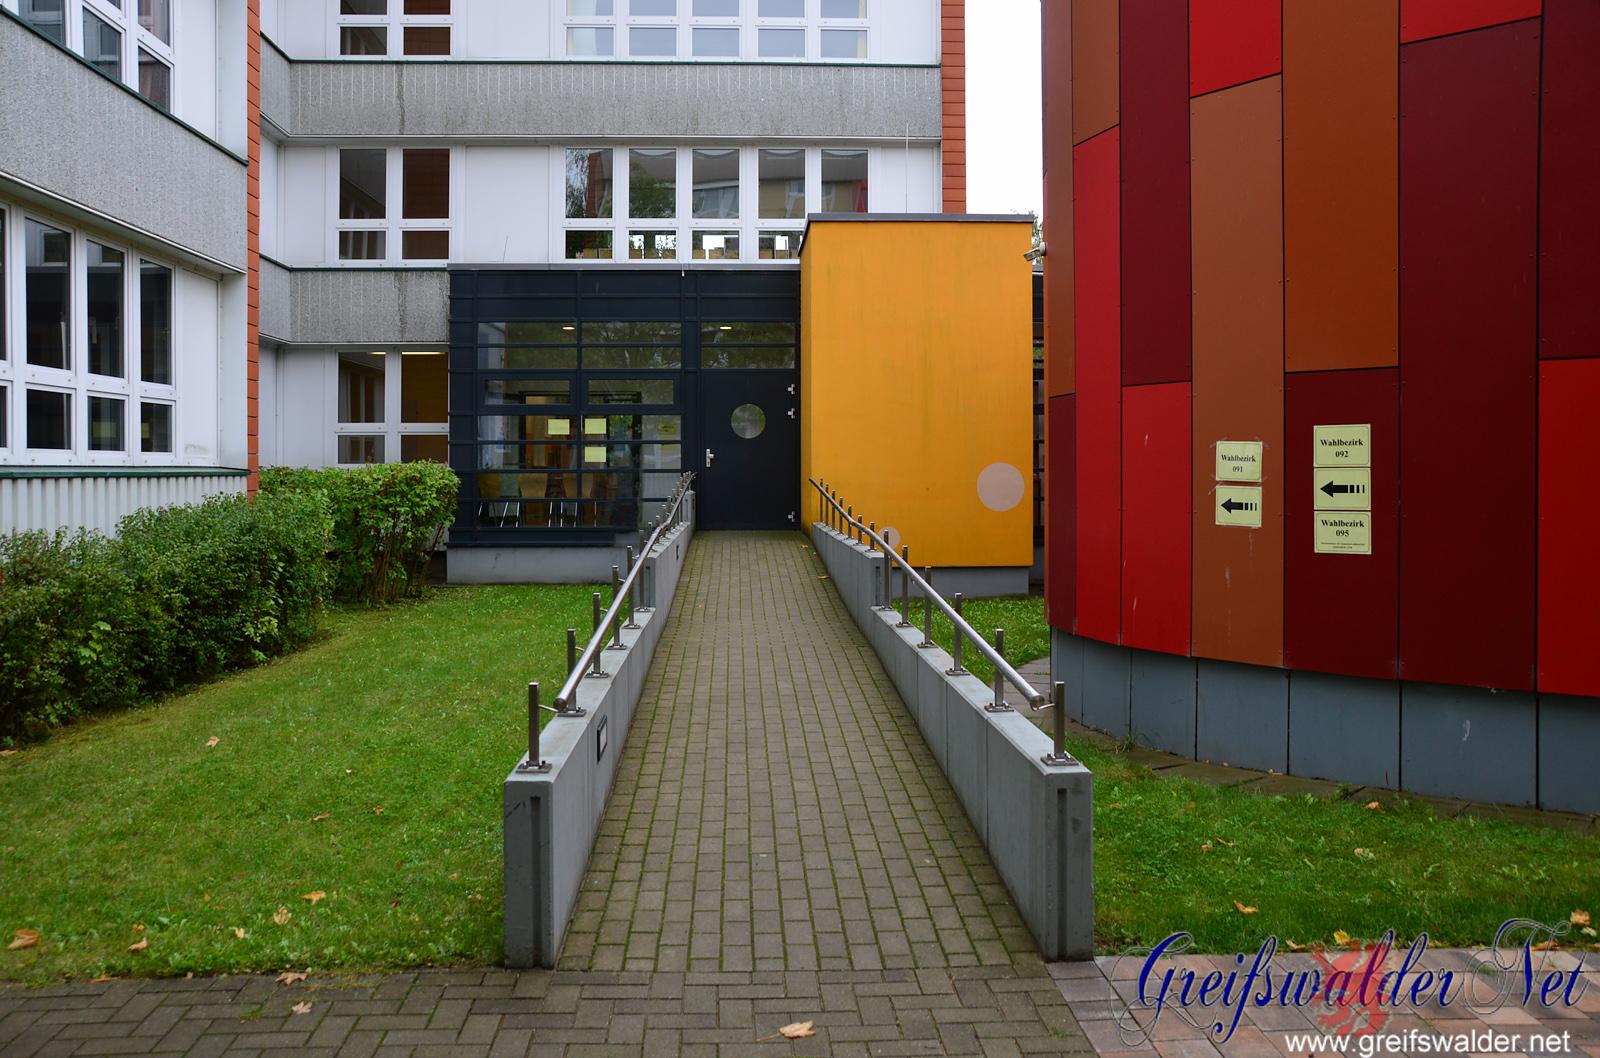 Wahlsonntag in Greifswald